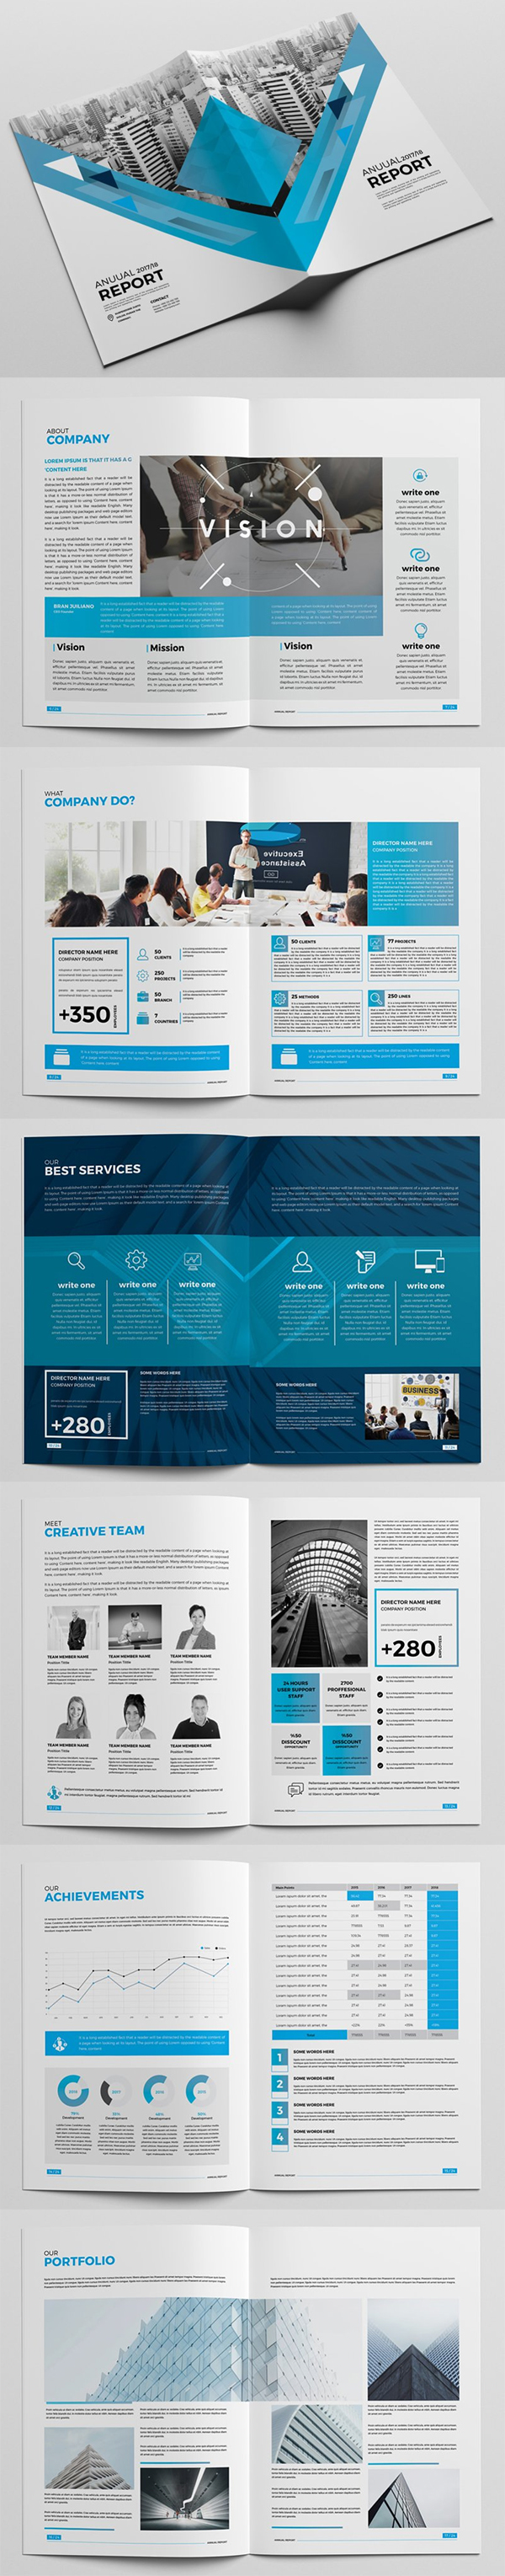 Simple Clean Annual Report Brochure Template